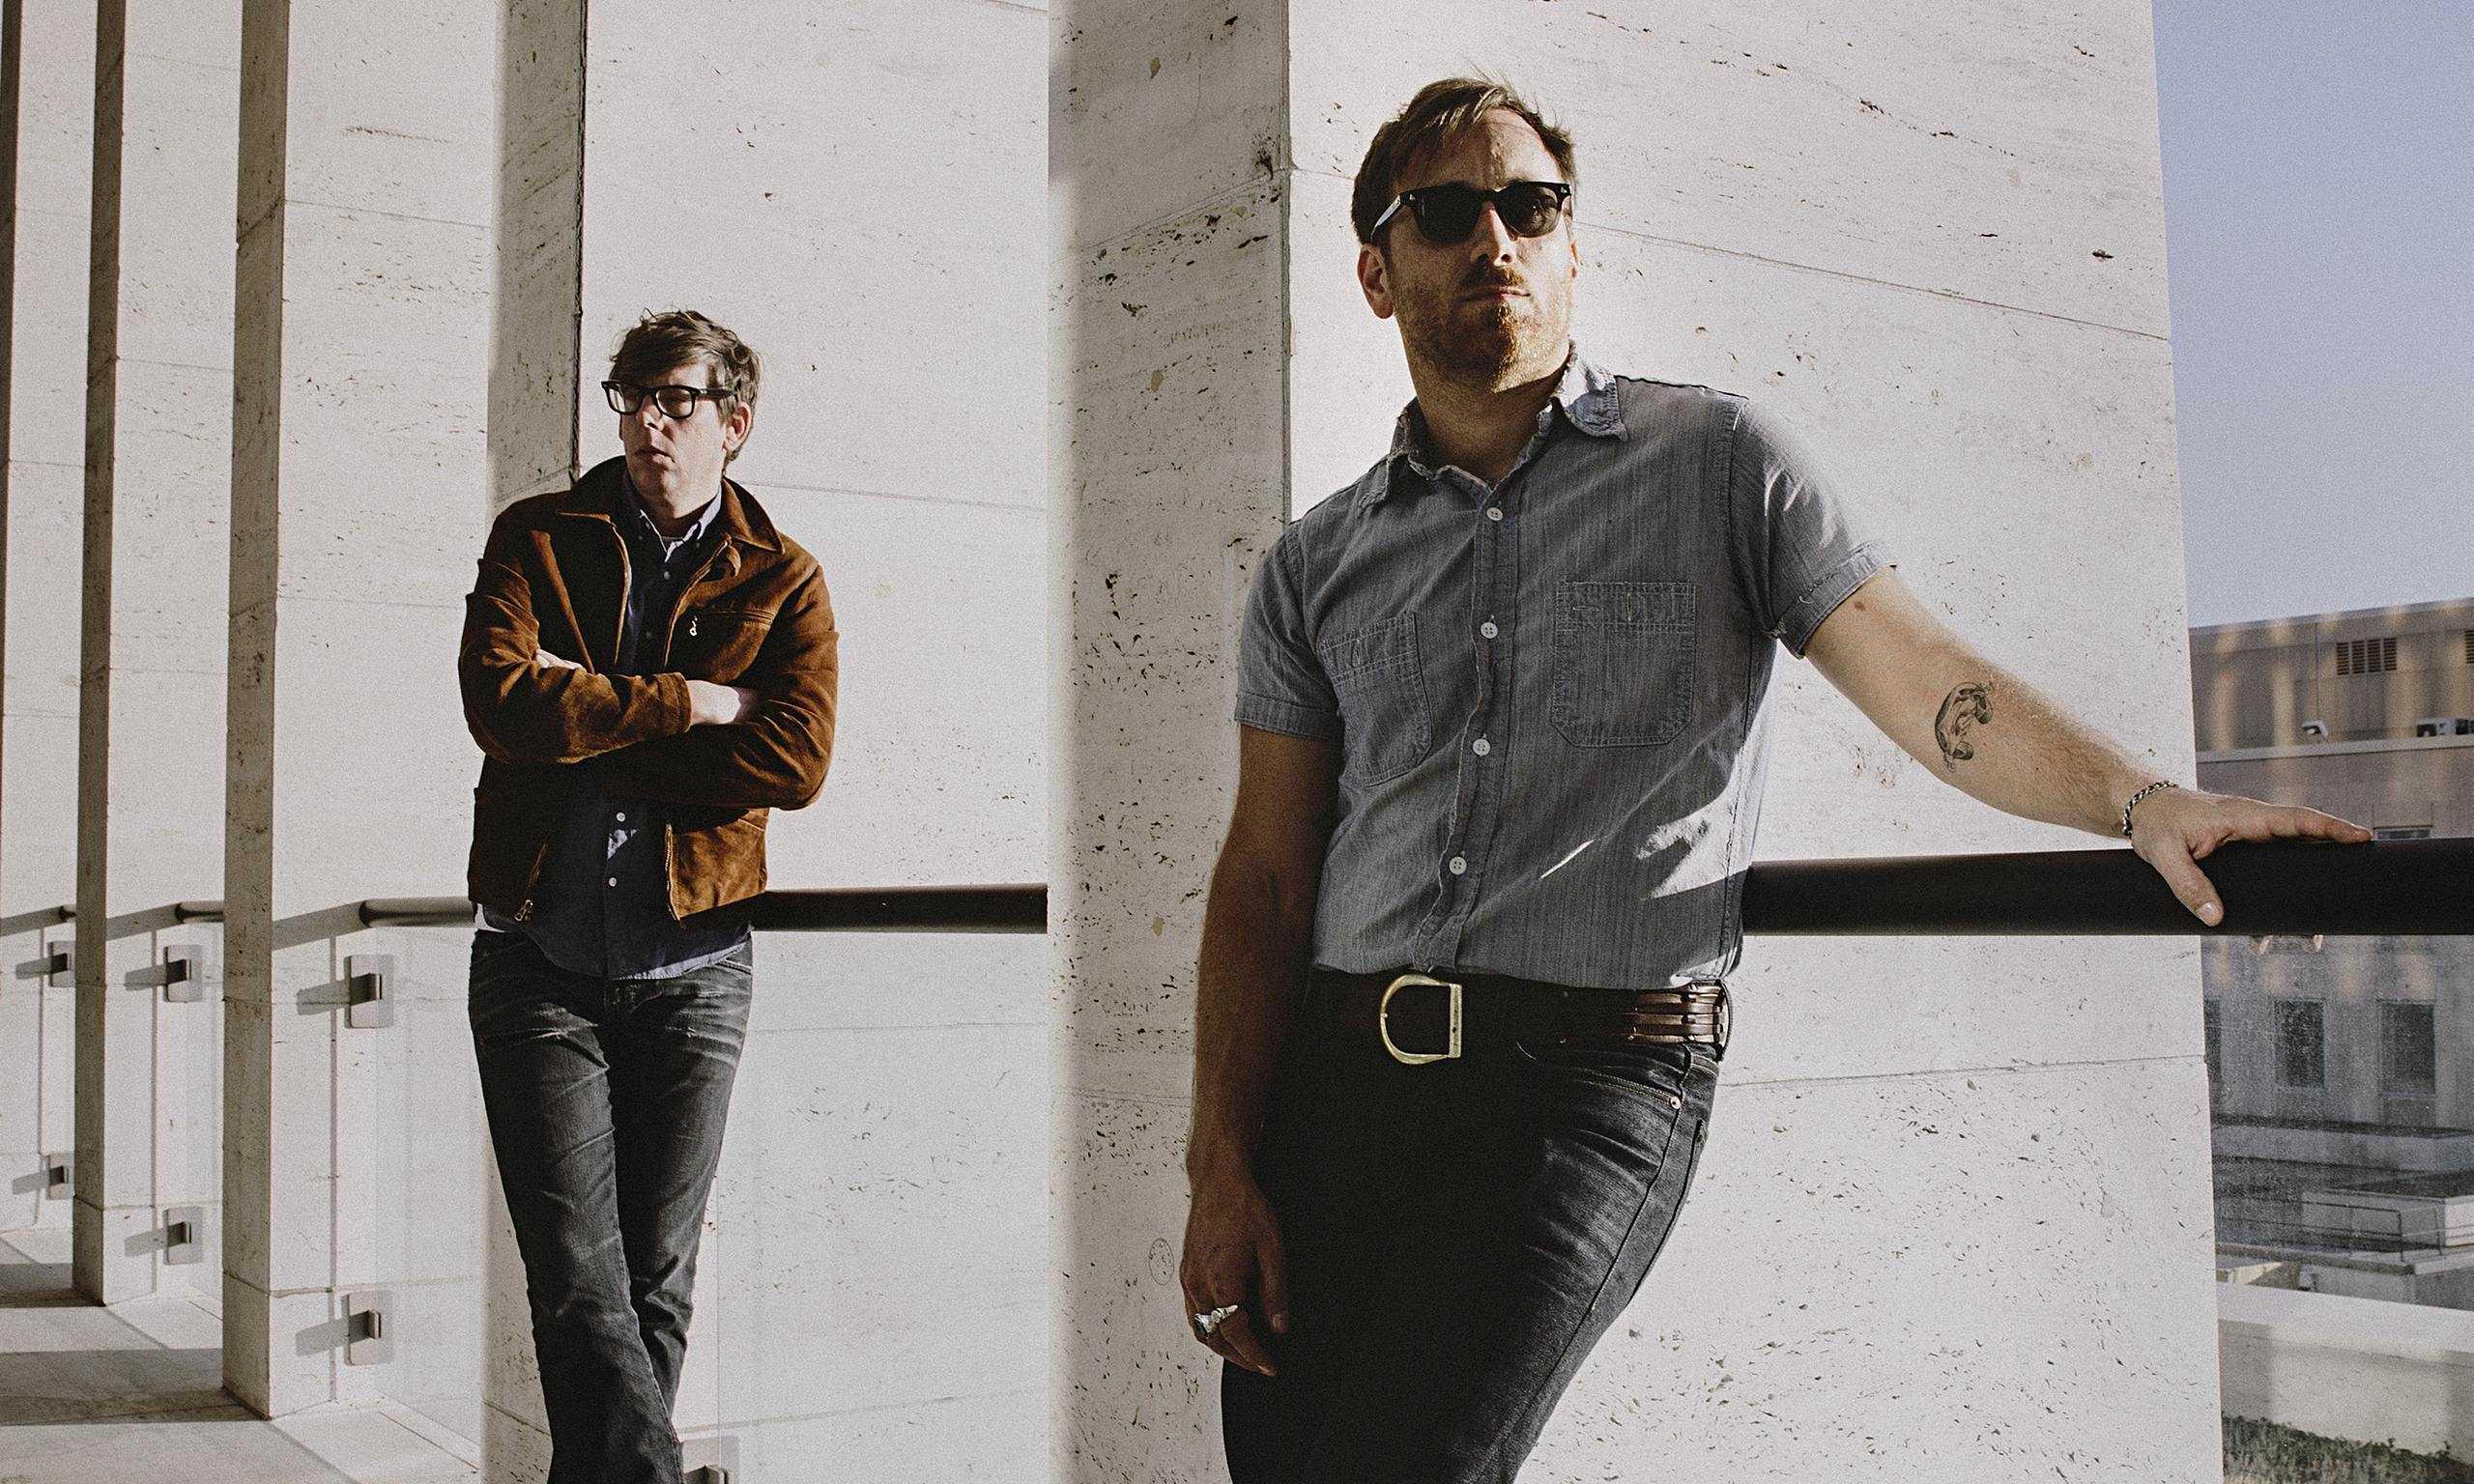 http://www.theguardian.com/music/2014/the-black-keys-turn-blue-review